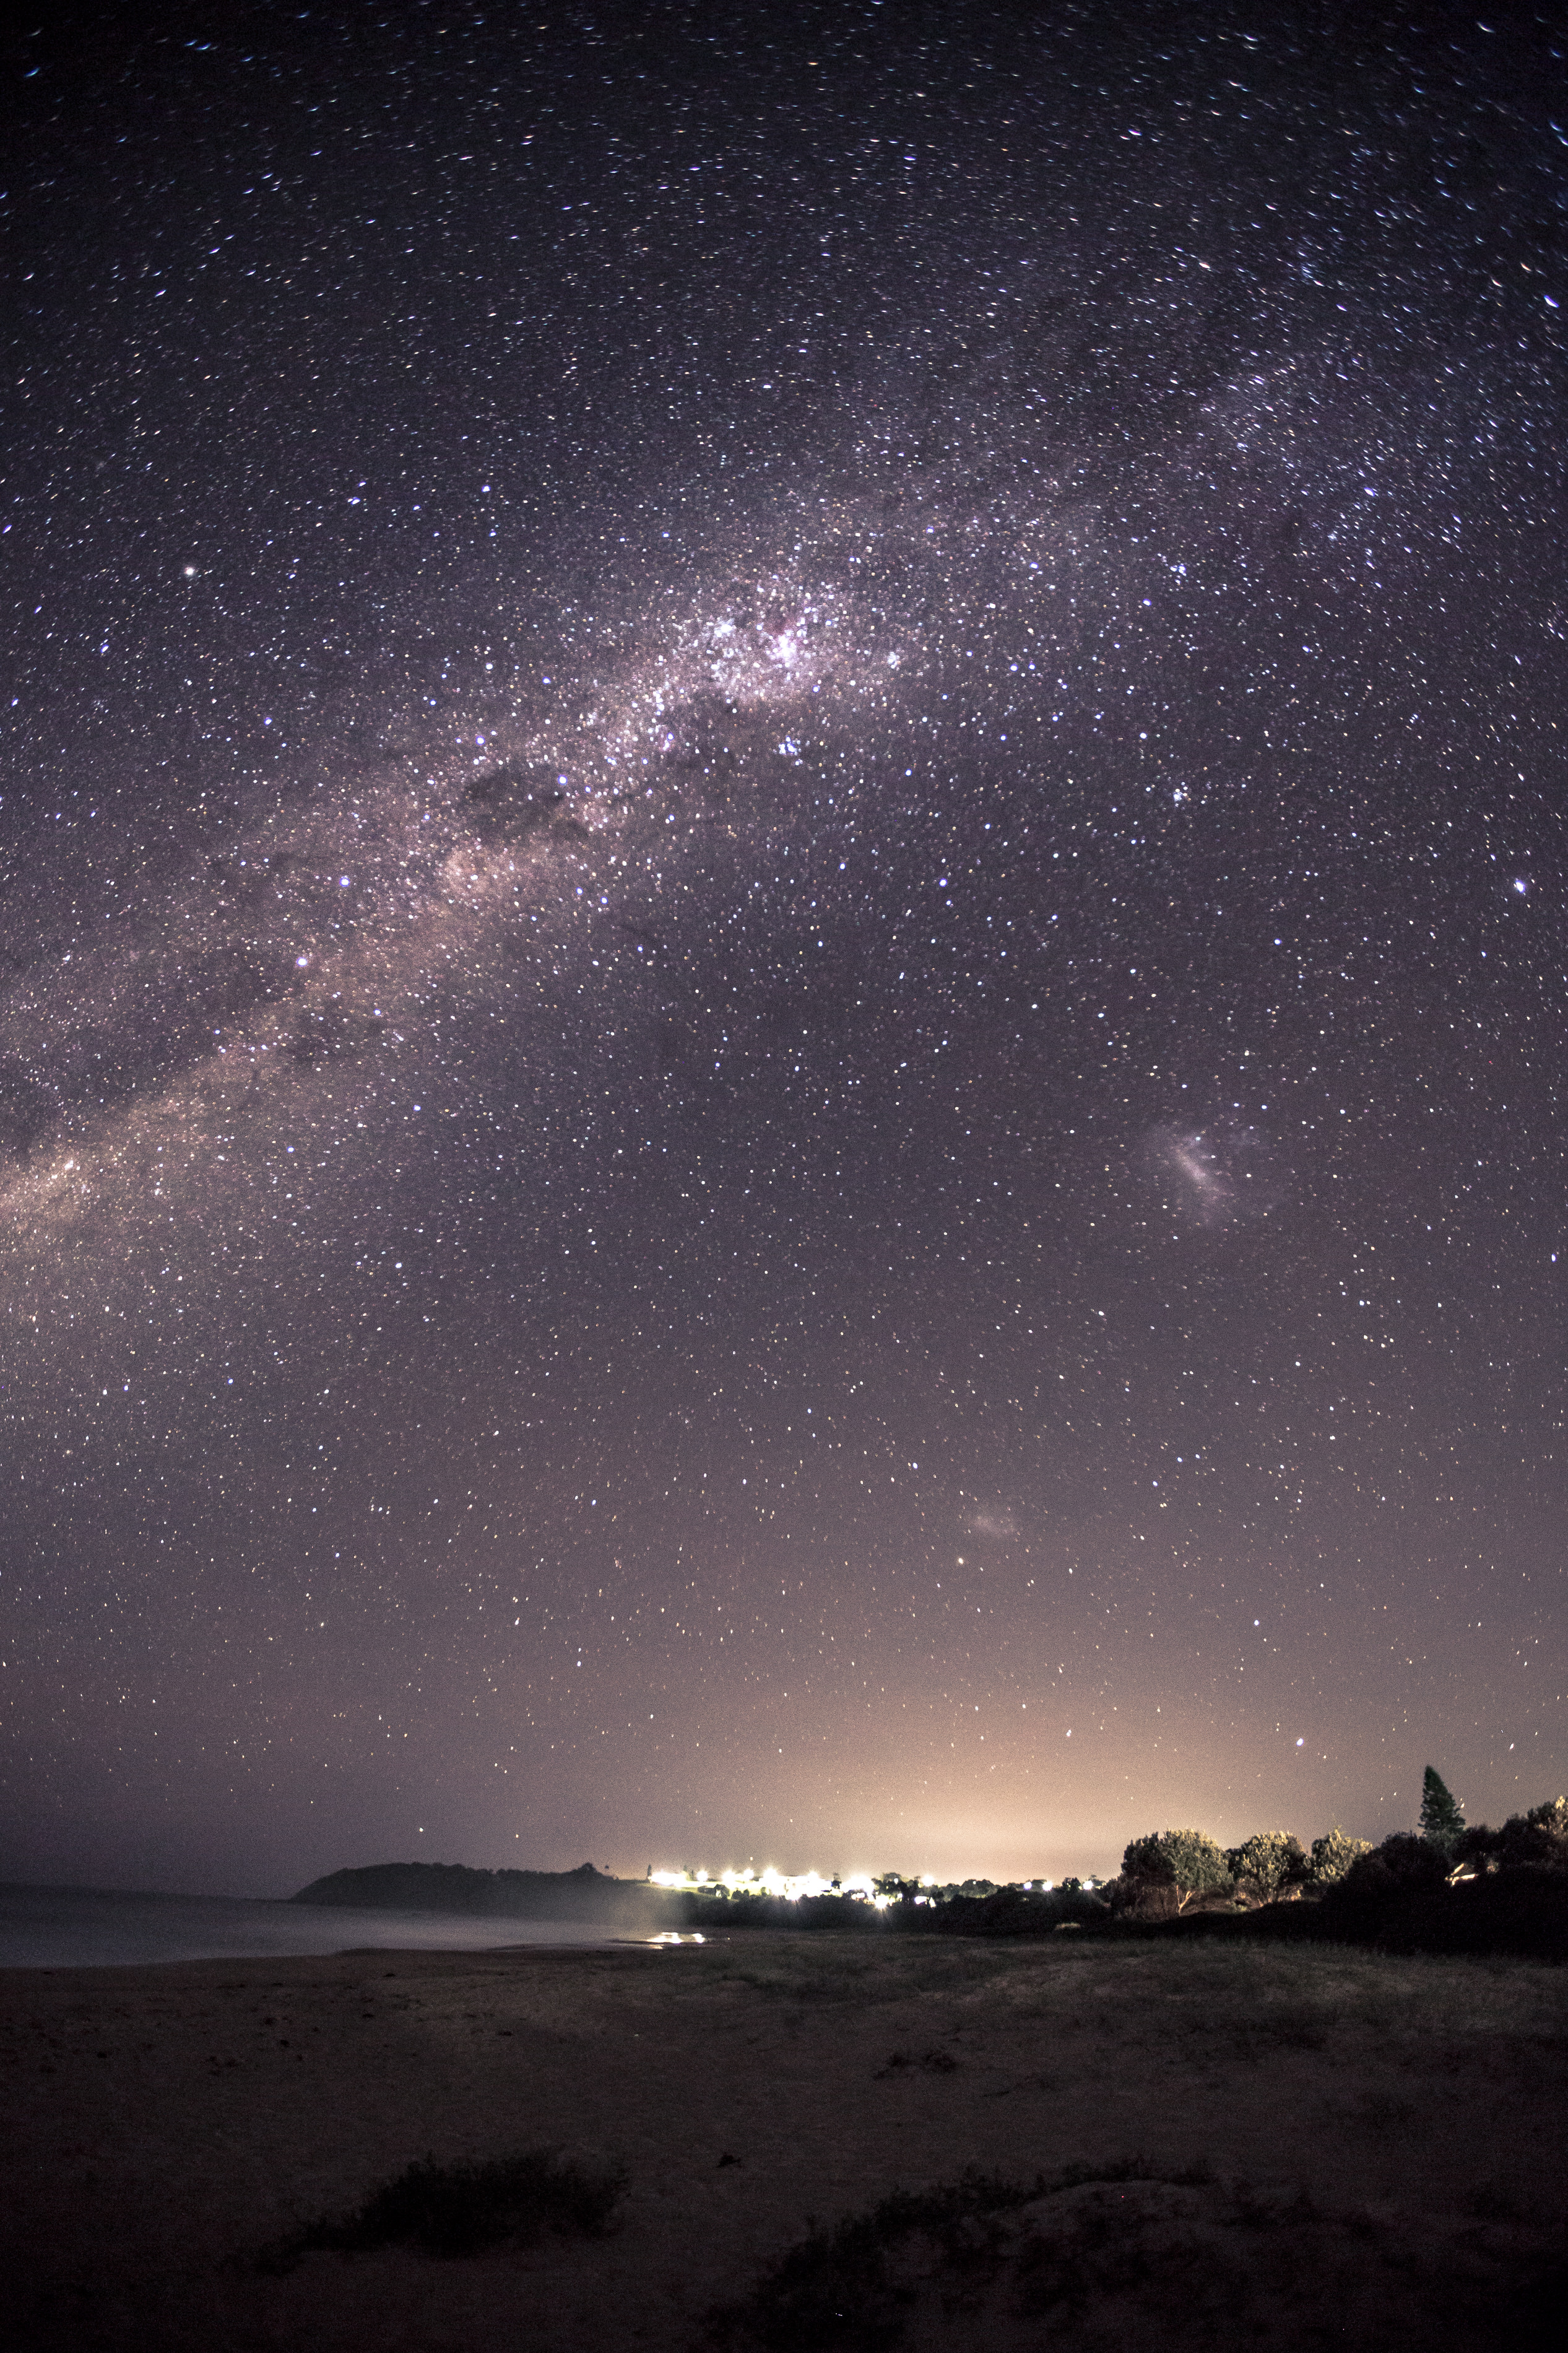 Diamond Beach Sky Photography using Long Exposure